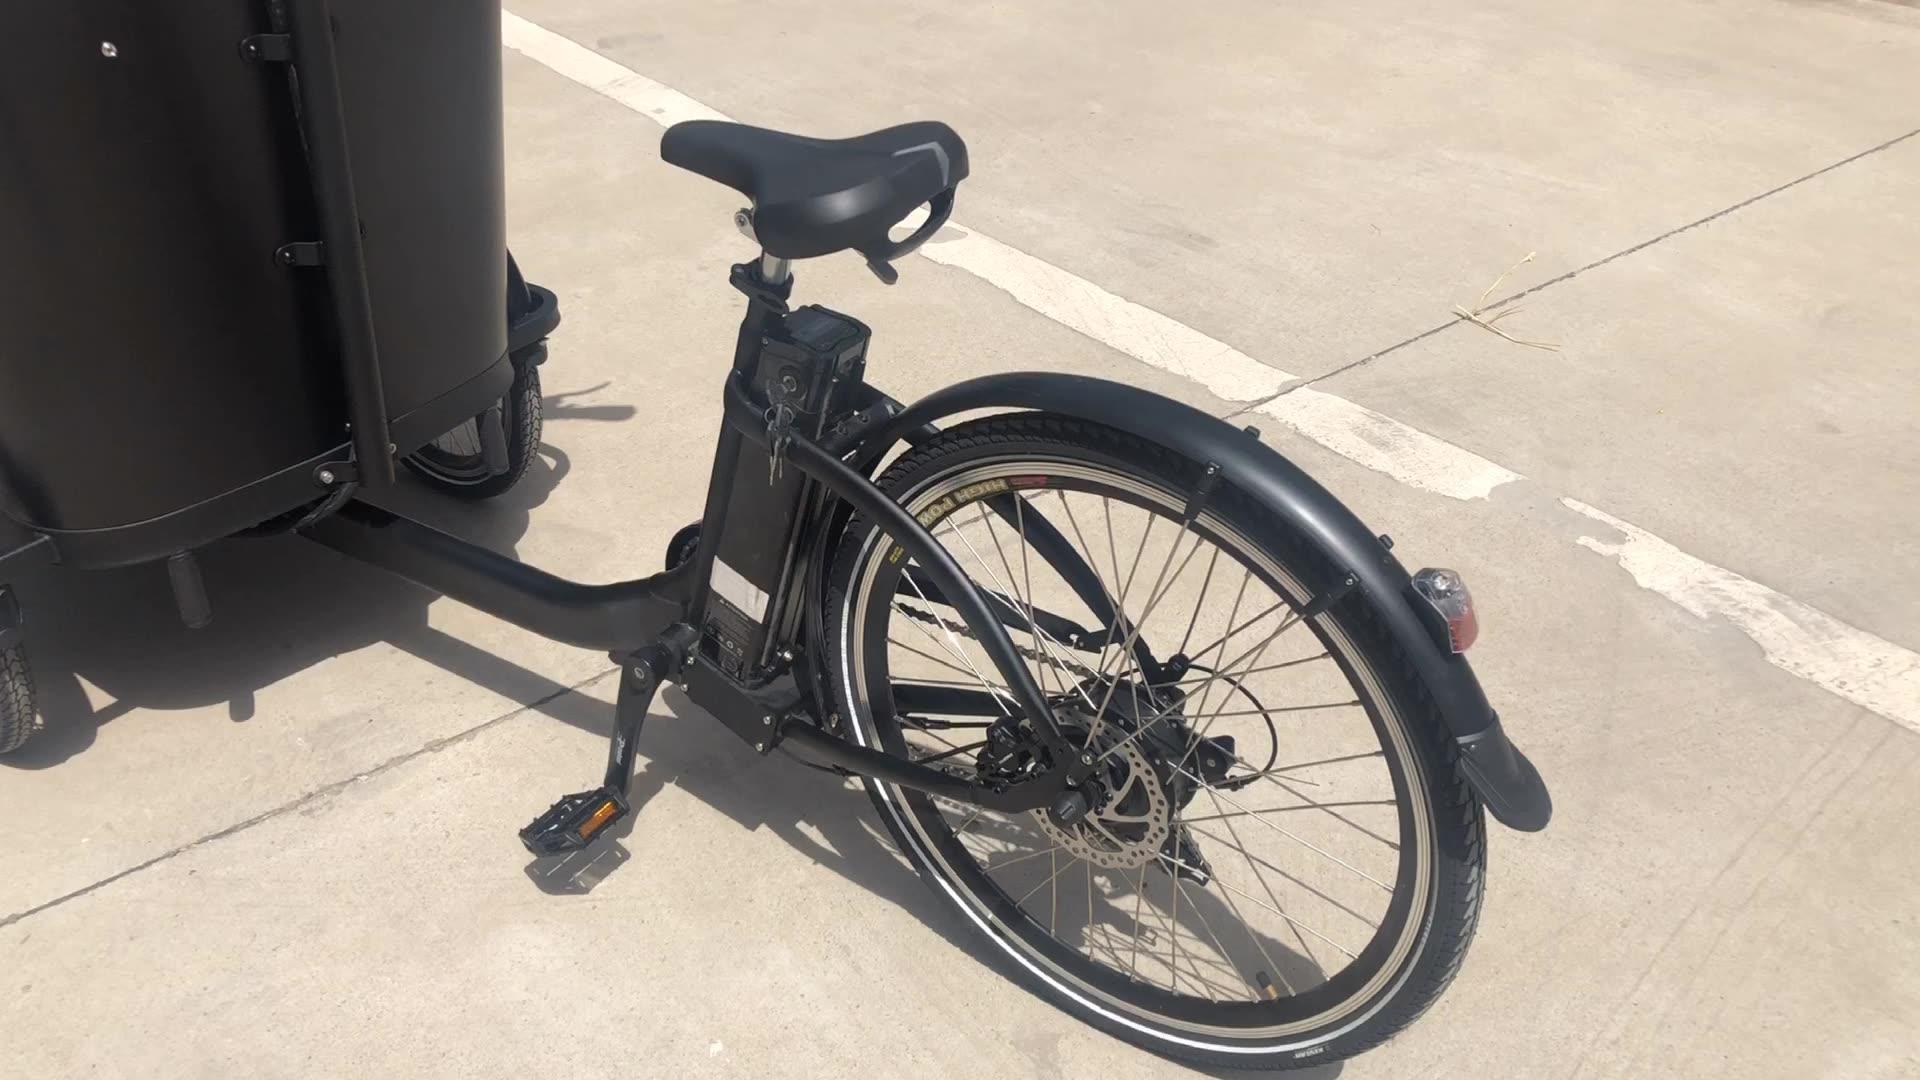 Diskon Sepeda Kargo 3 Roda Elektrik, Bingkai Sepeda Aluminium